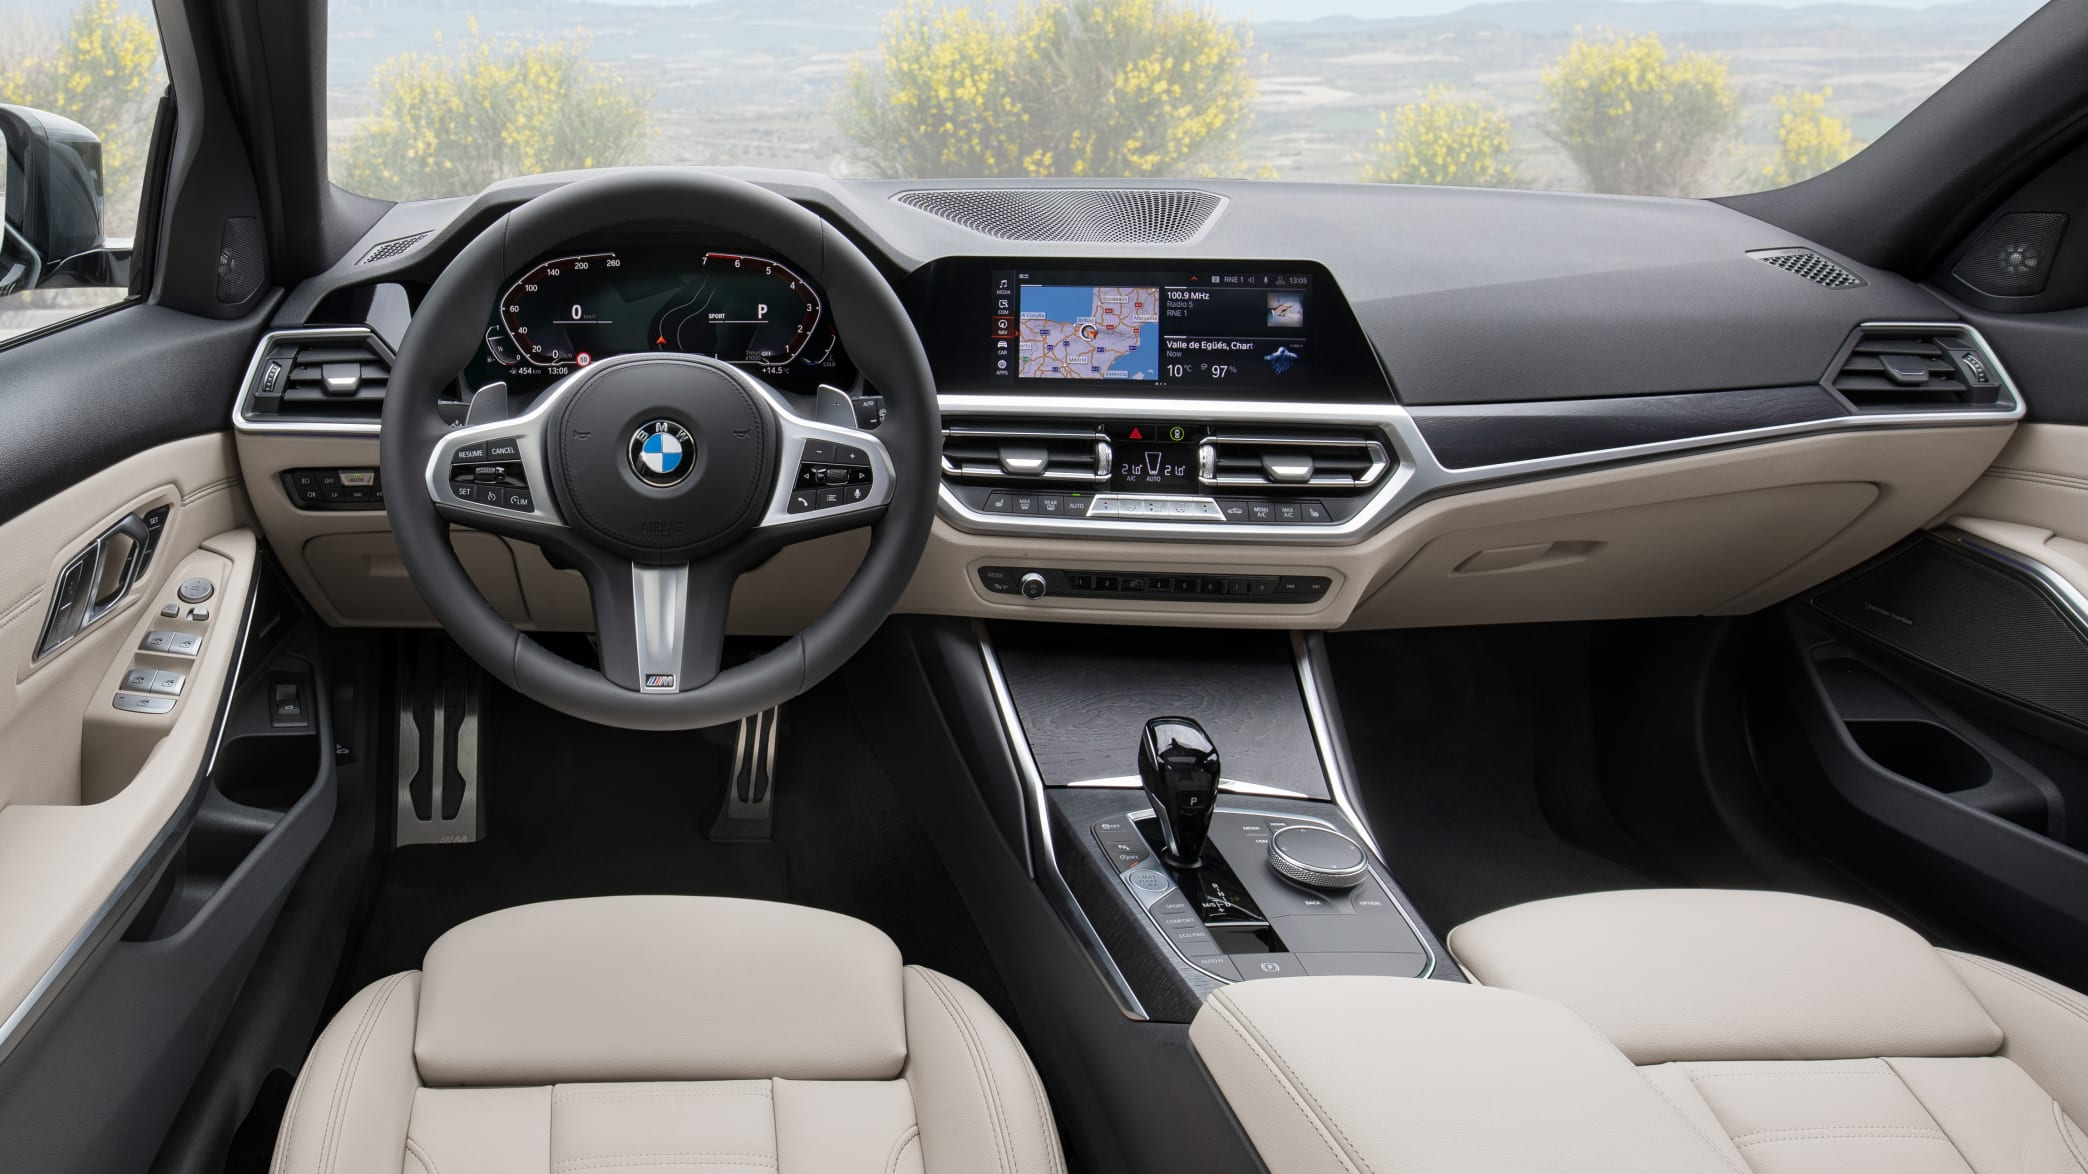 Das Cockpit des BMW 3er Touring